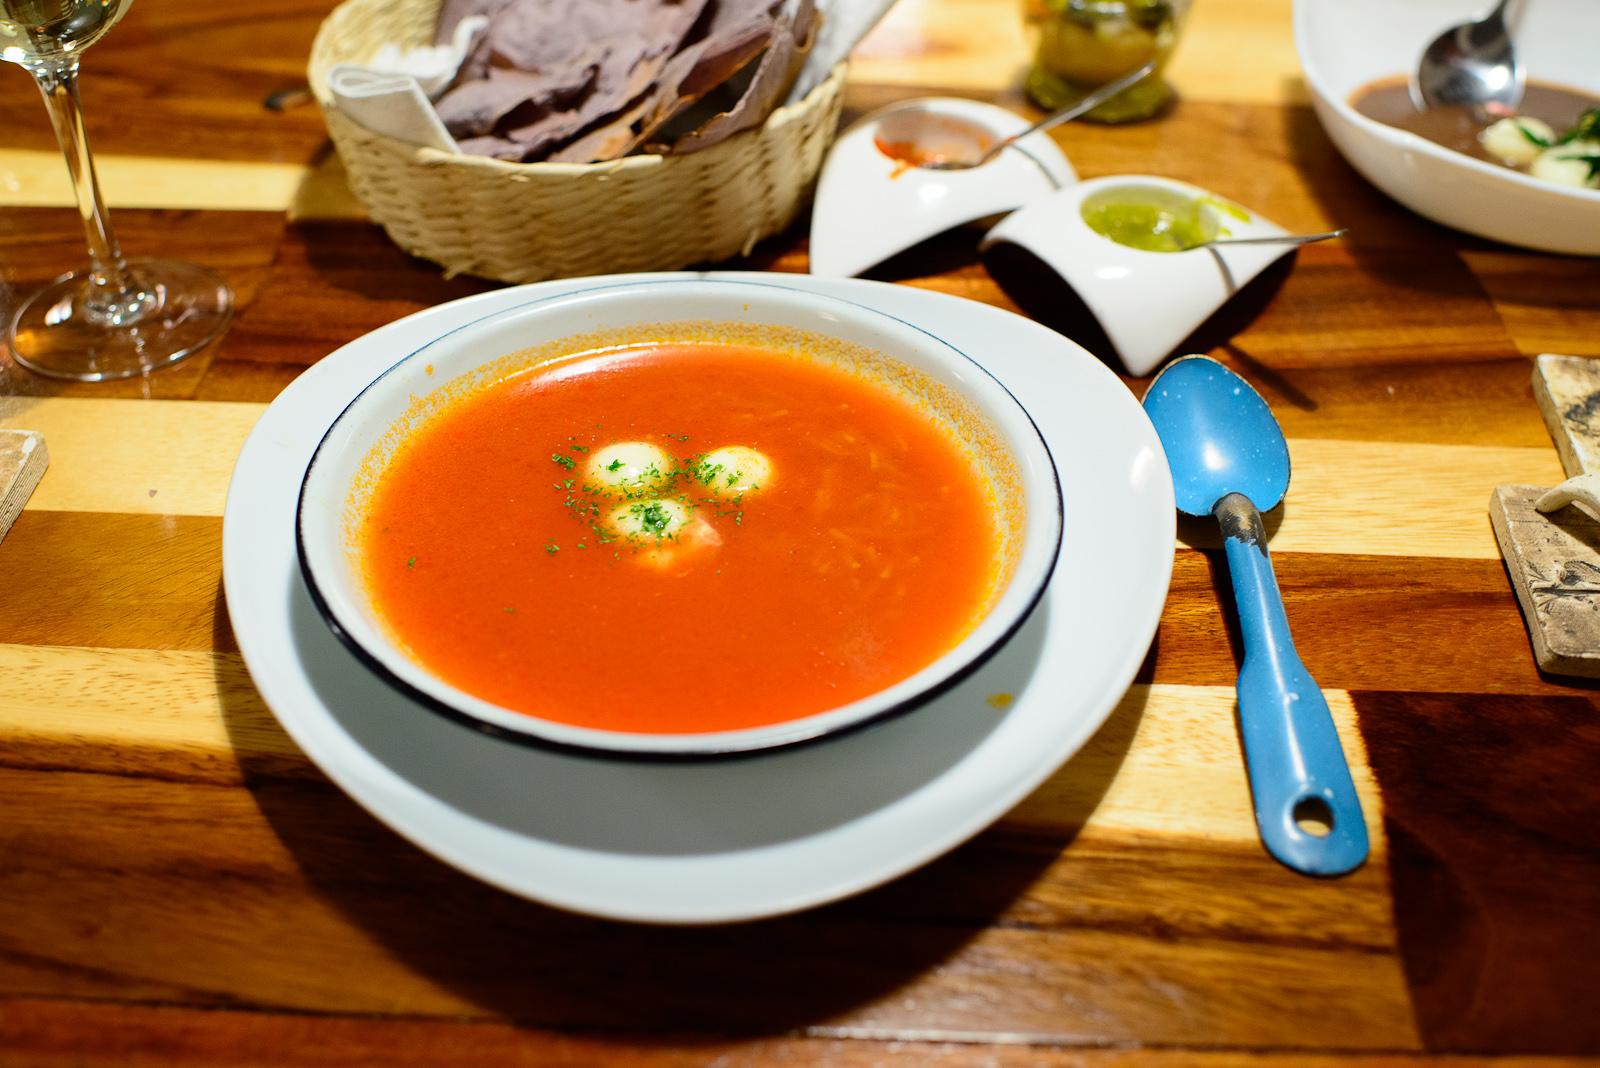 3rd Course: Fideos secos - noodle soup, cream cheese, tomato, an